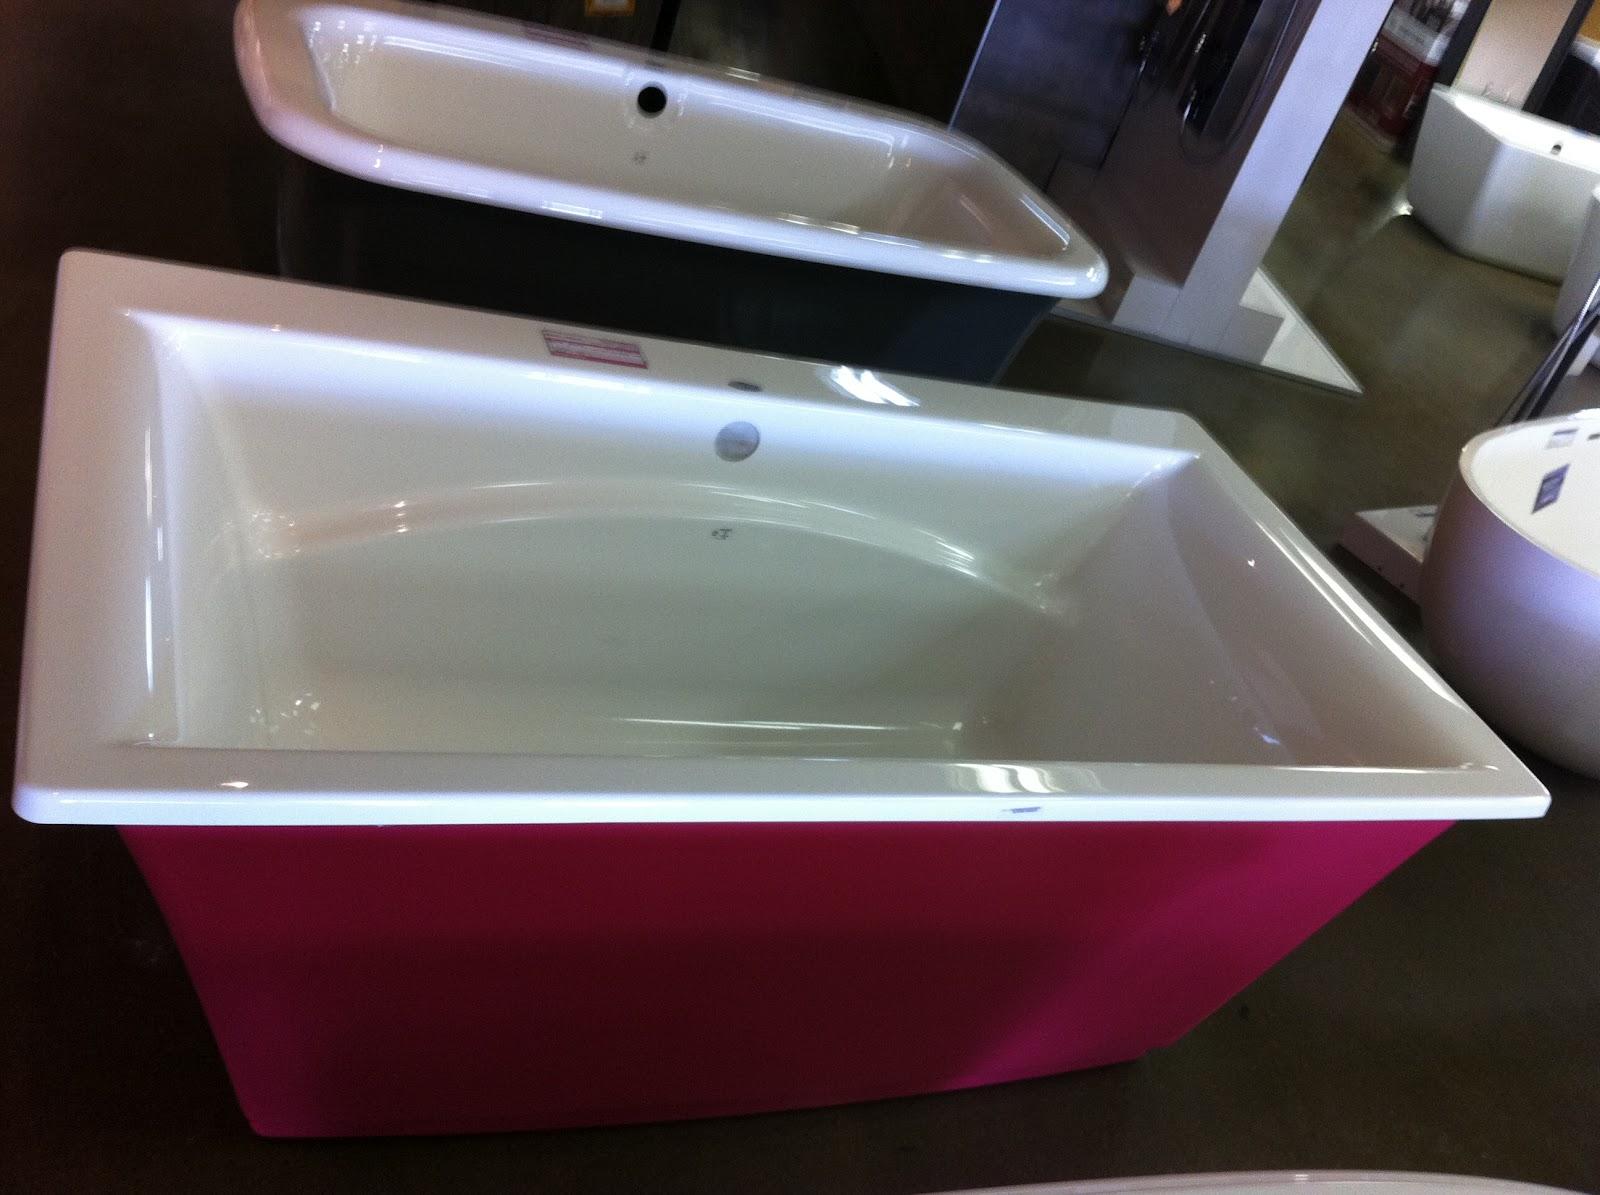 To Da Loos Are Coloured Bathtubs Making A Comeback - Colored-bathtubs